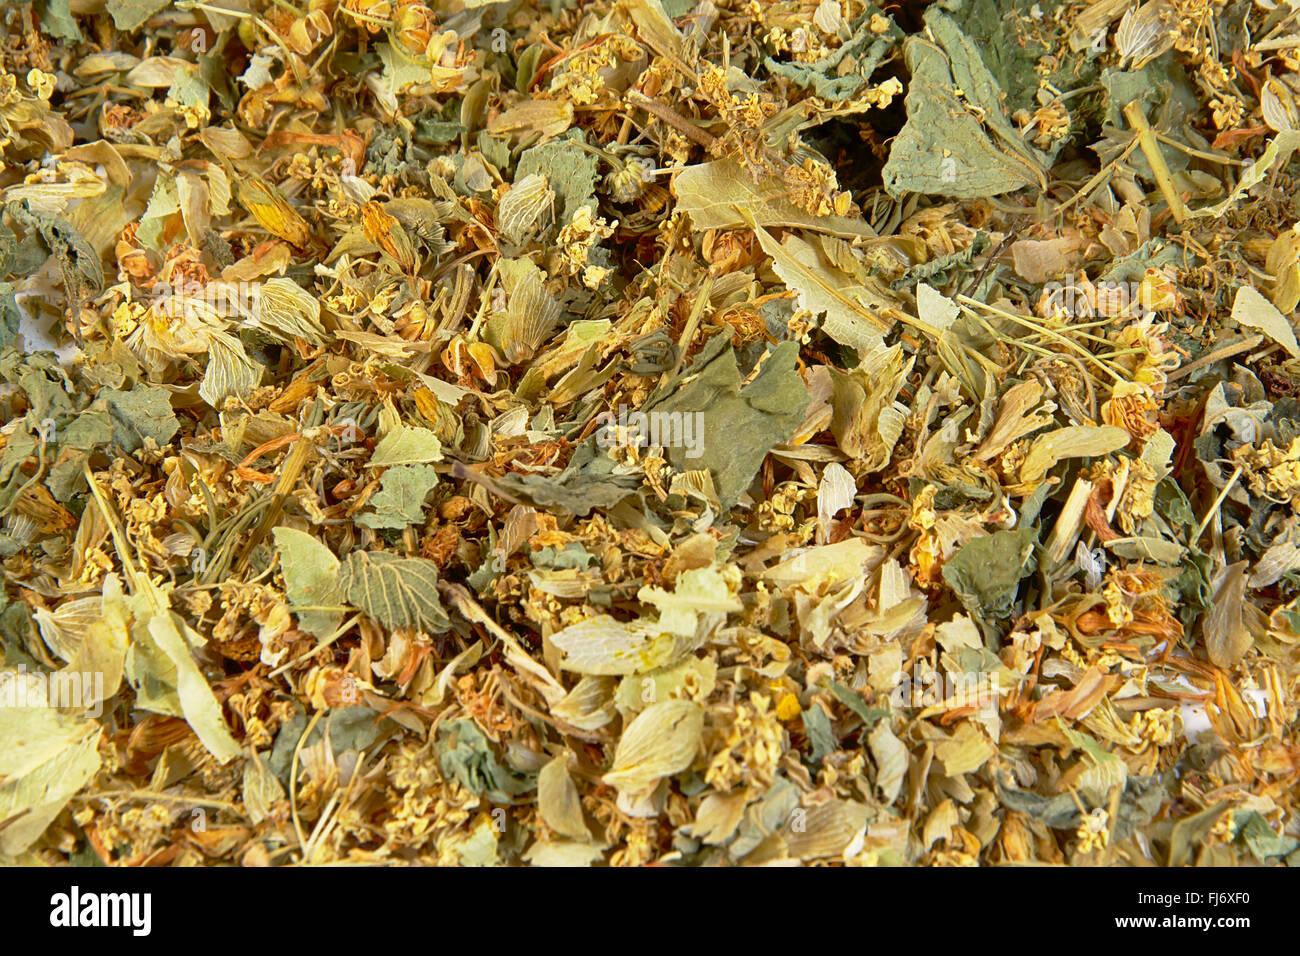 herbal stomach and bowel supporting tea. (lemon balmleaf, spearmint leaf, chamomile flower, calendula flower,meadowsweet) - Stock Image